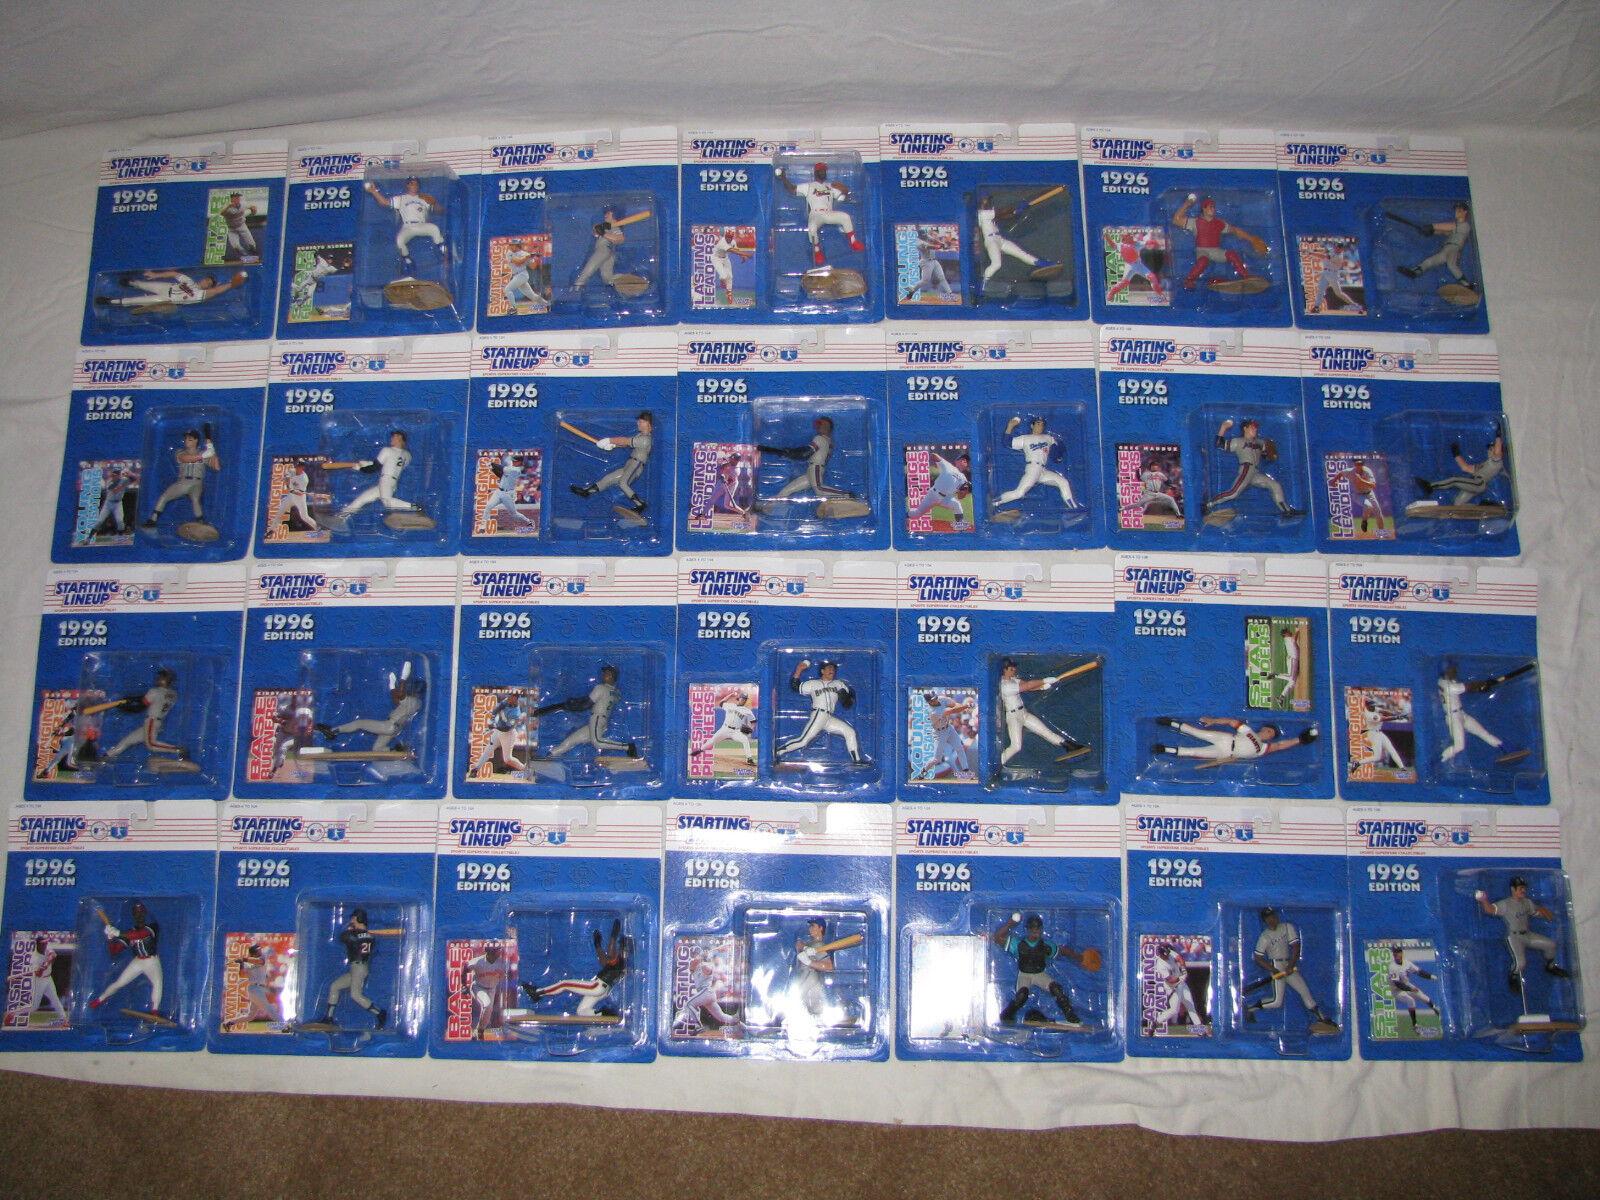 Estrellating Lineup béisbol 1996 28 higos-Nomo, Puckett, bonos, Ripken (2), Piazza